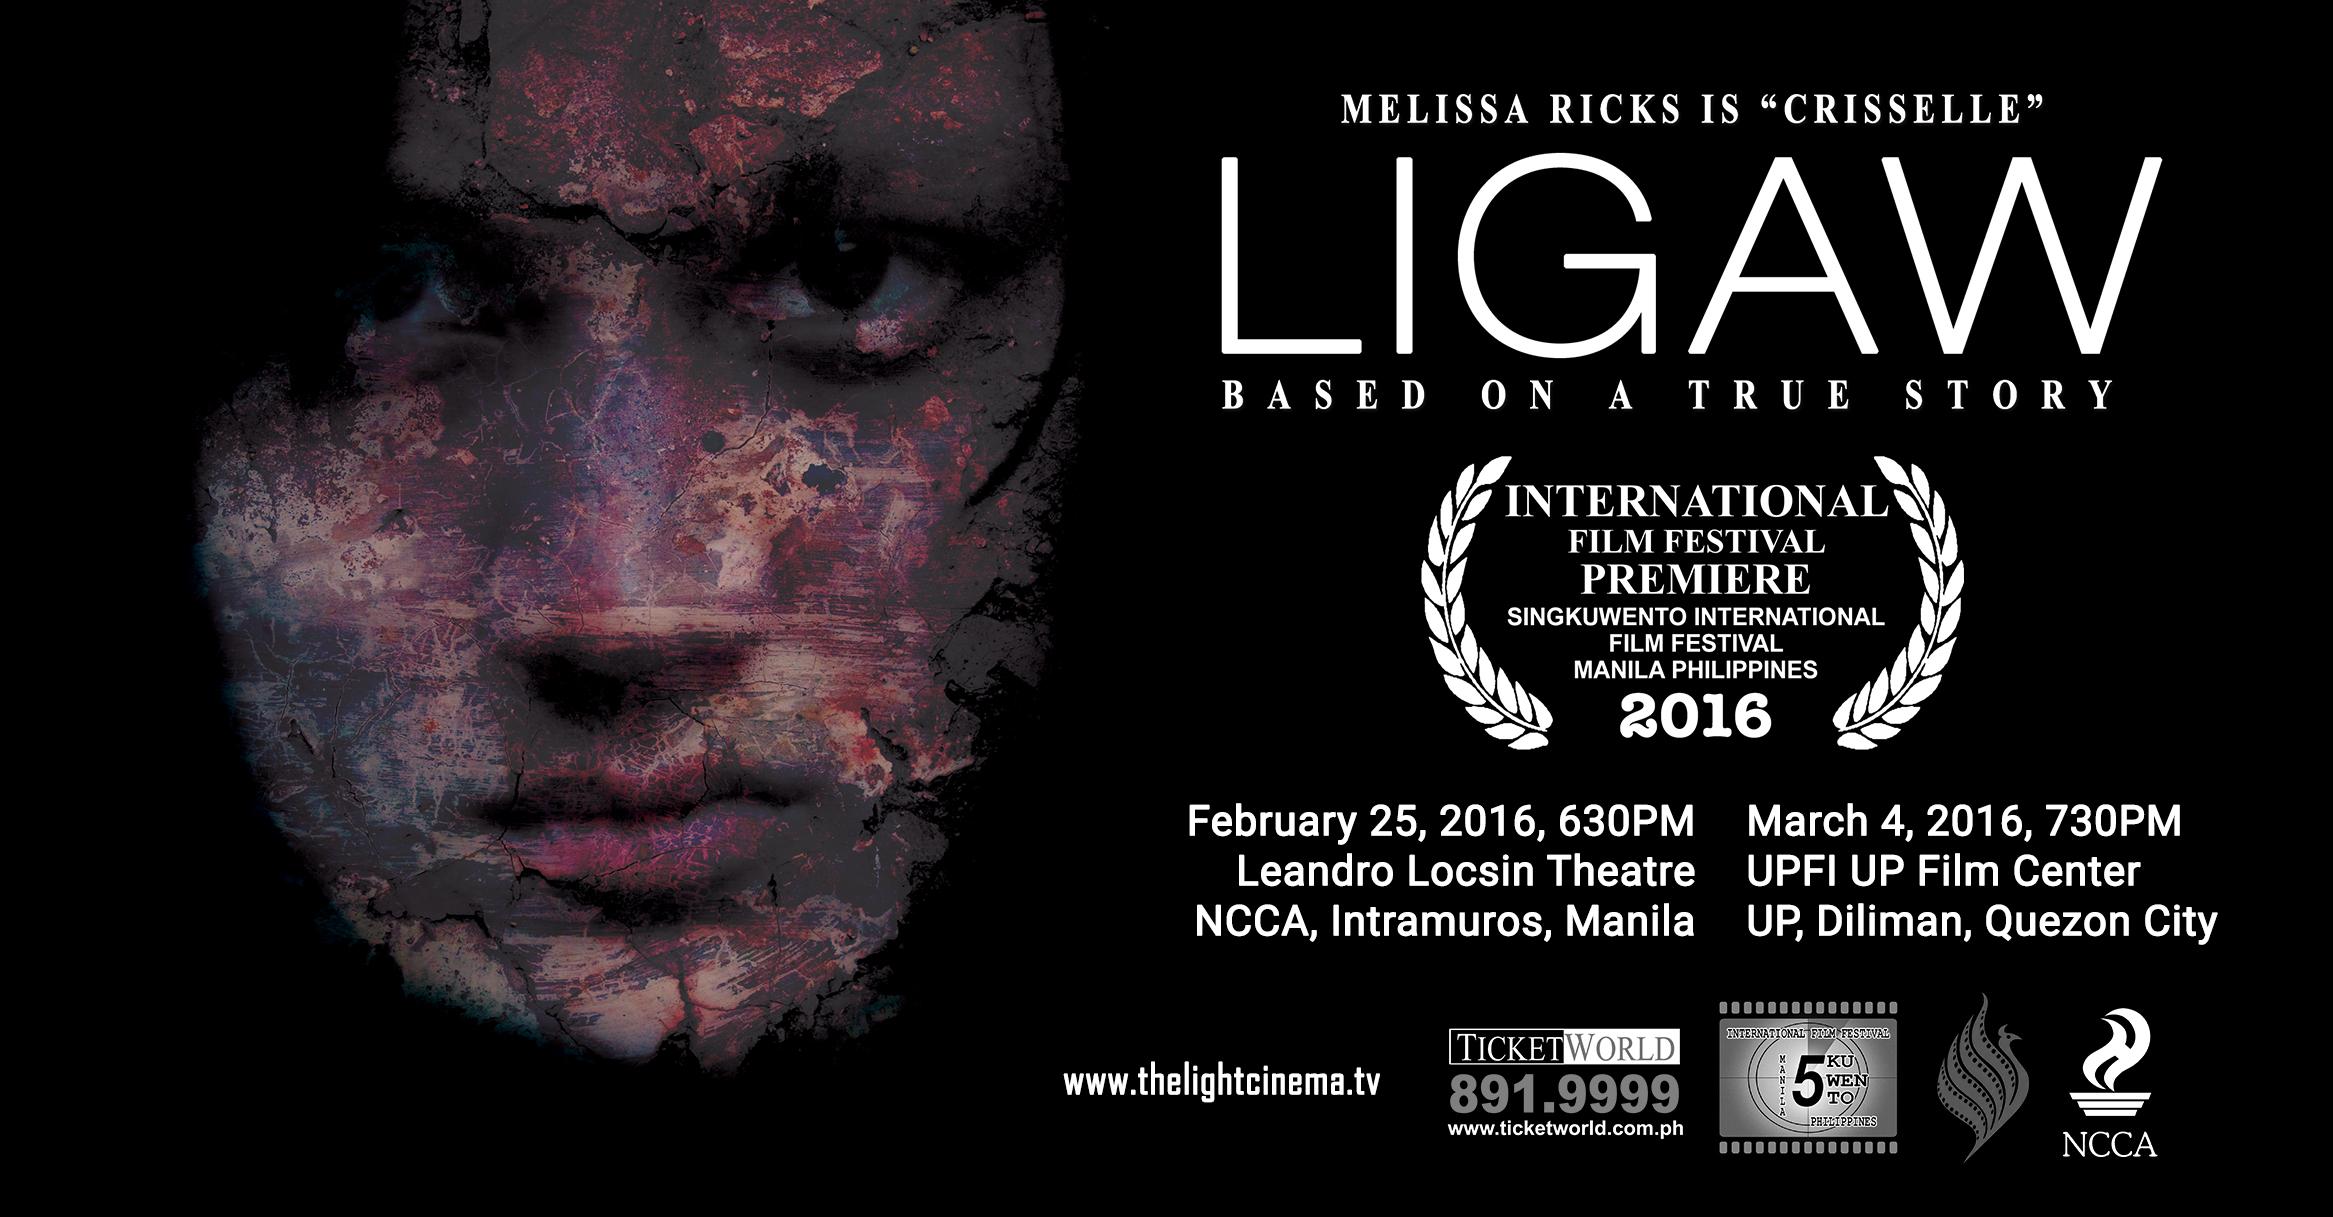 2016 tagalog movies horror